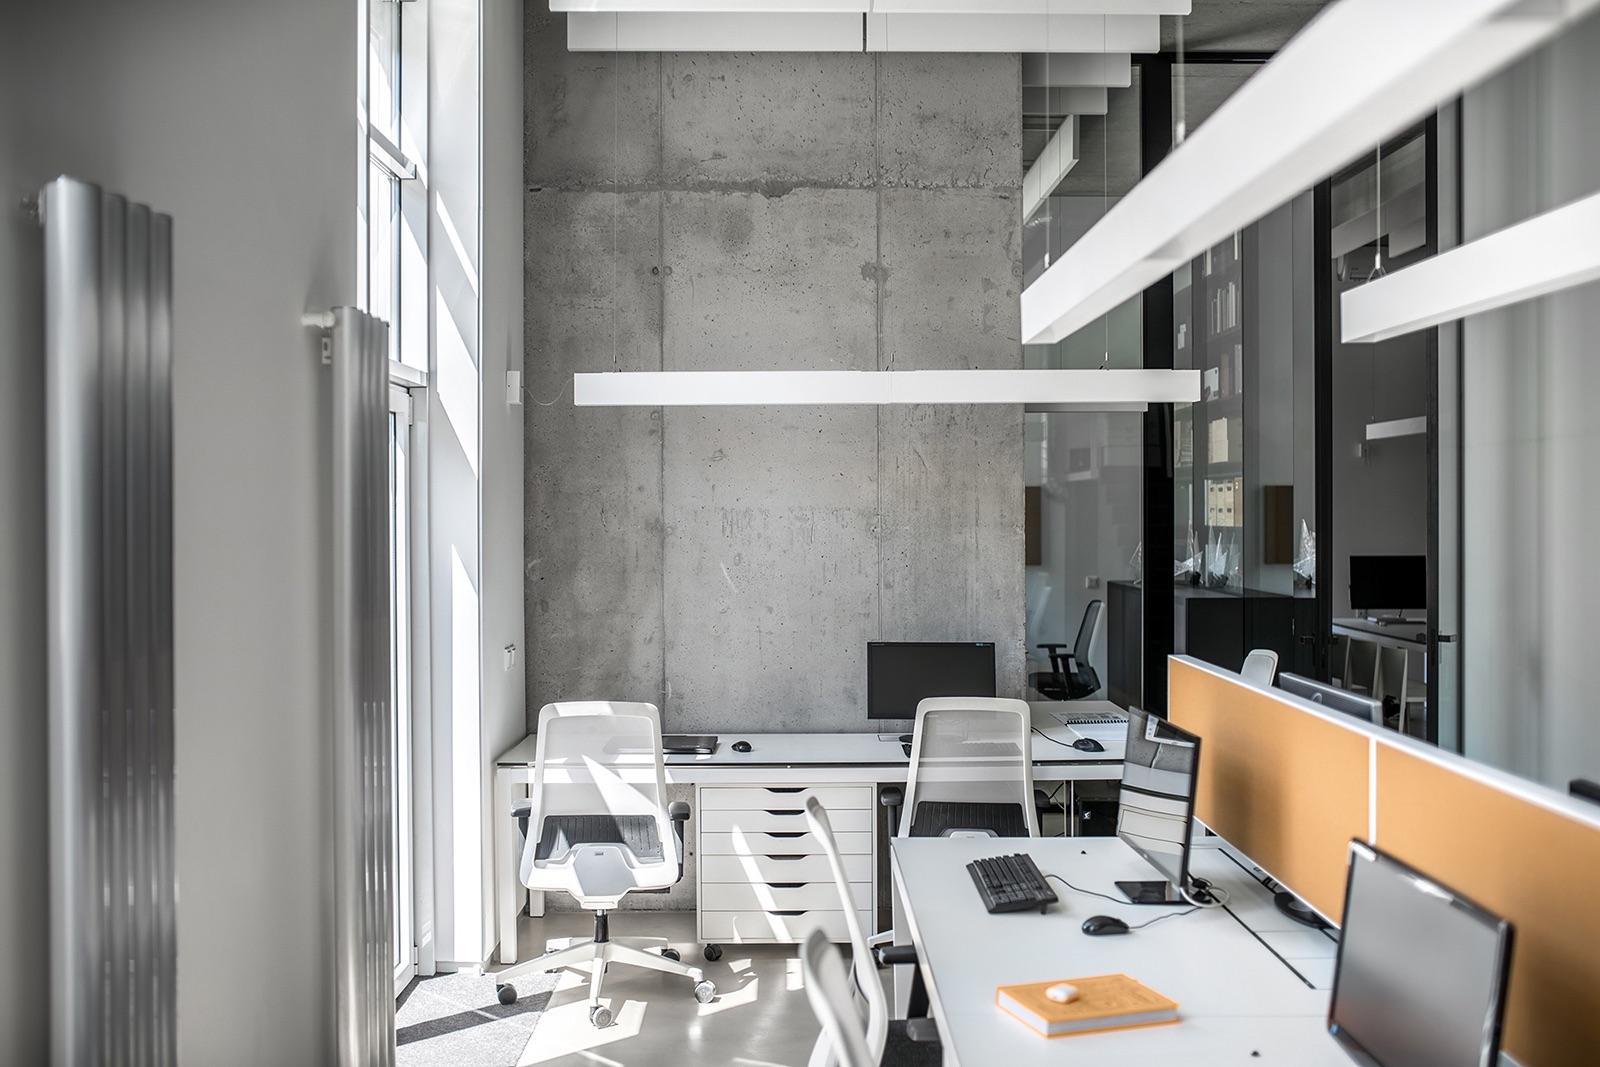 yod-design-lab-office-4